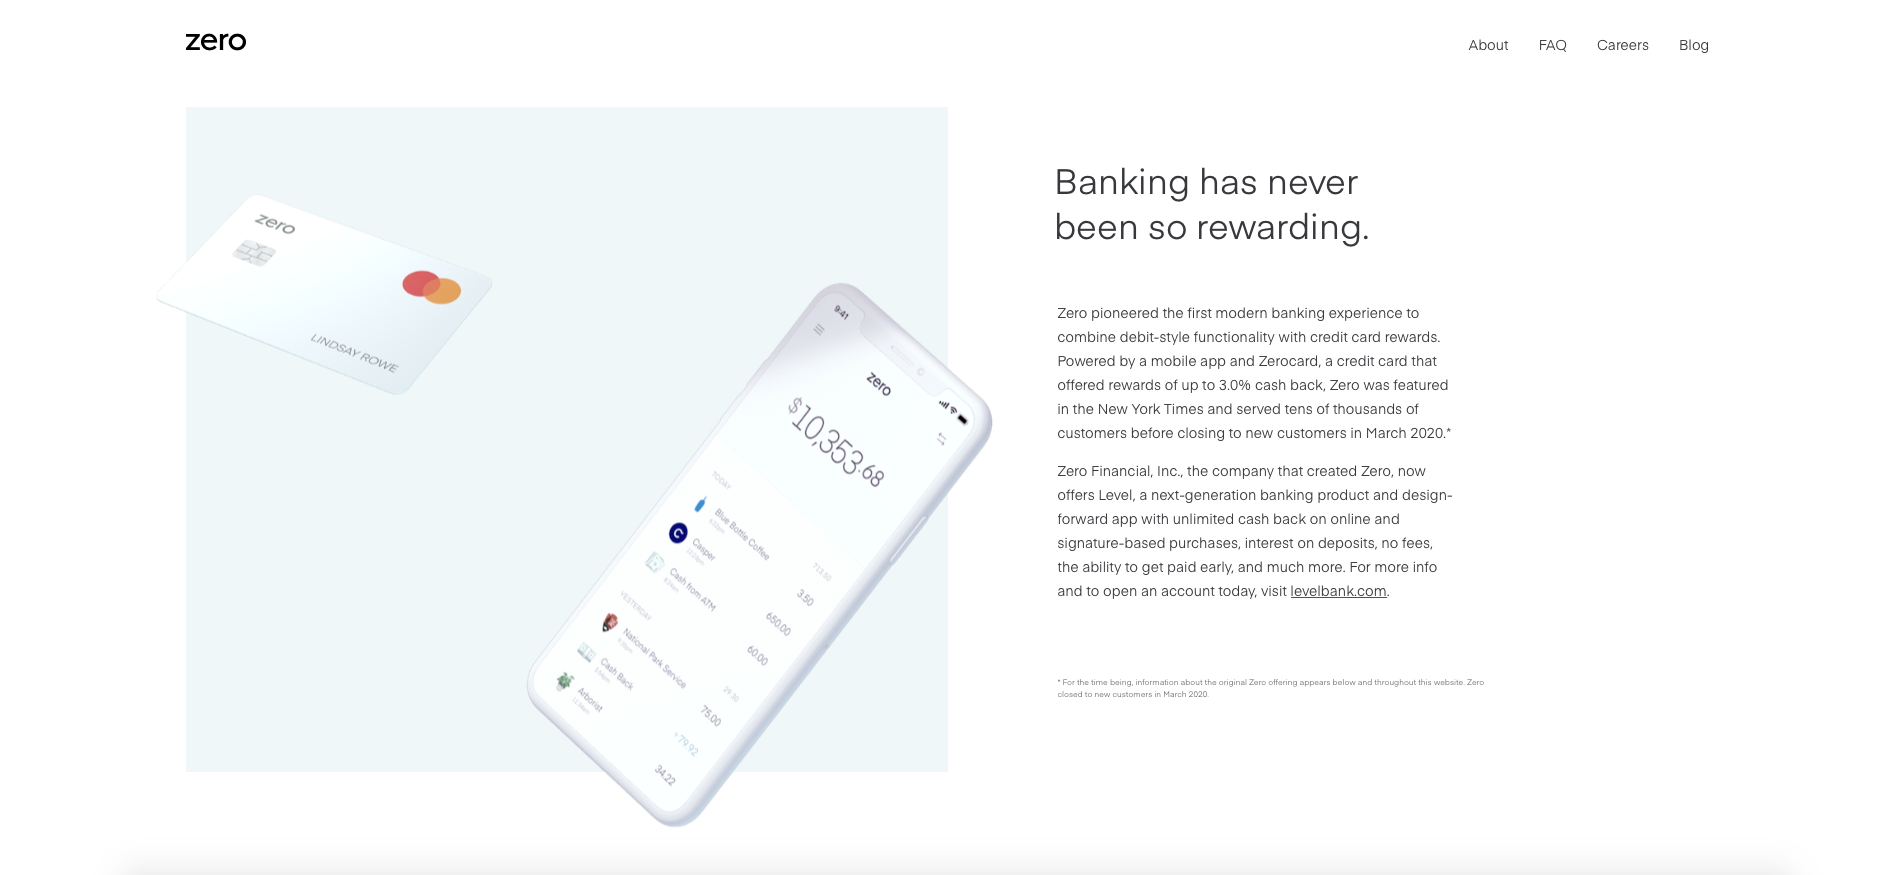 Zero online banking